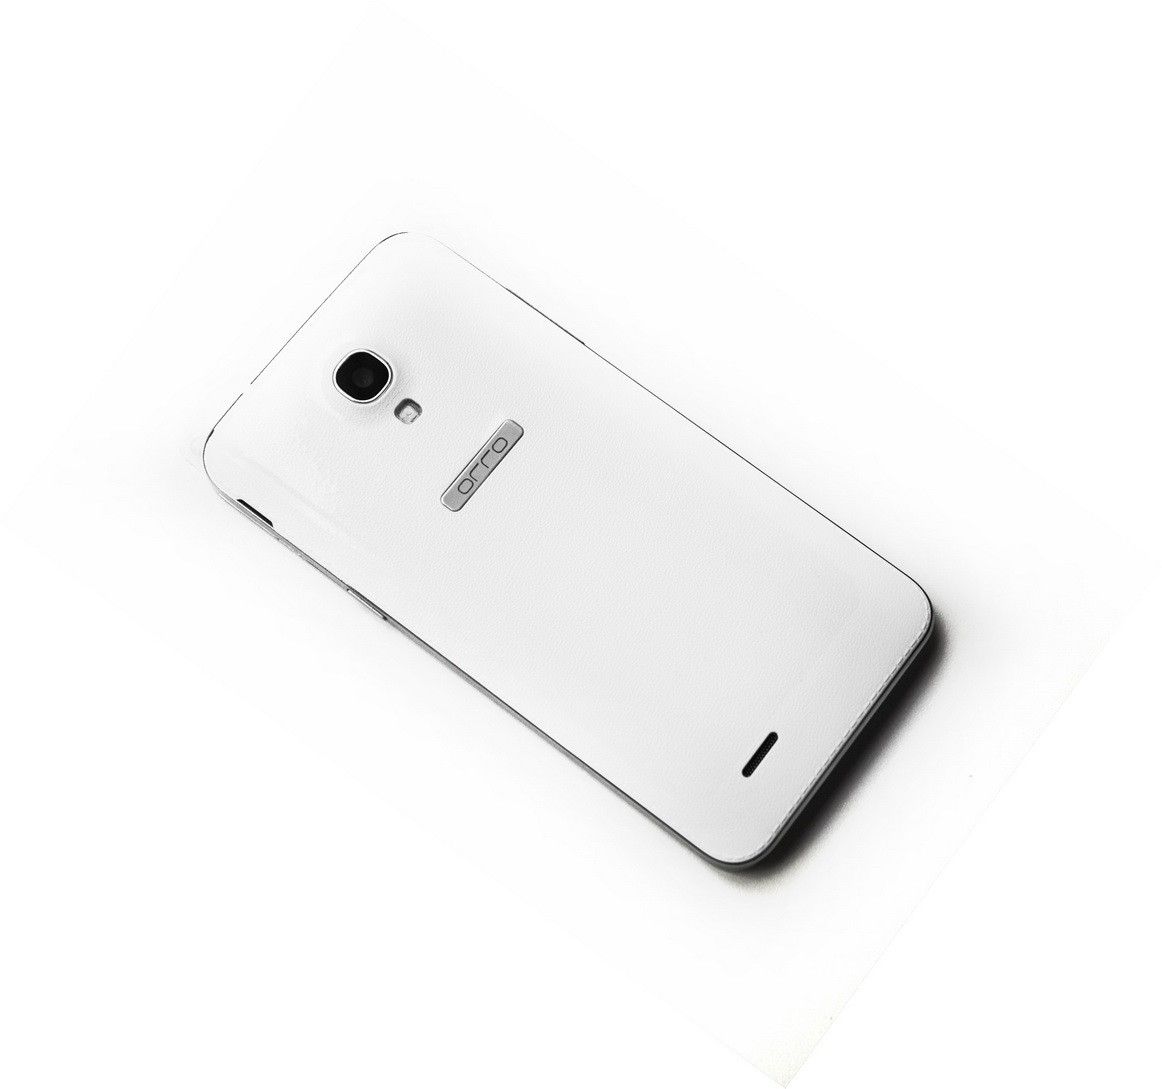 Oppo R9 обошёл iPhone попопулярности вКитайской народной республике